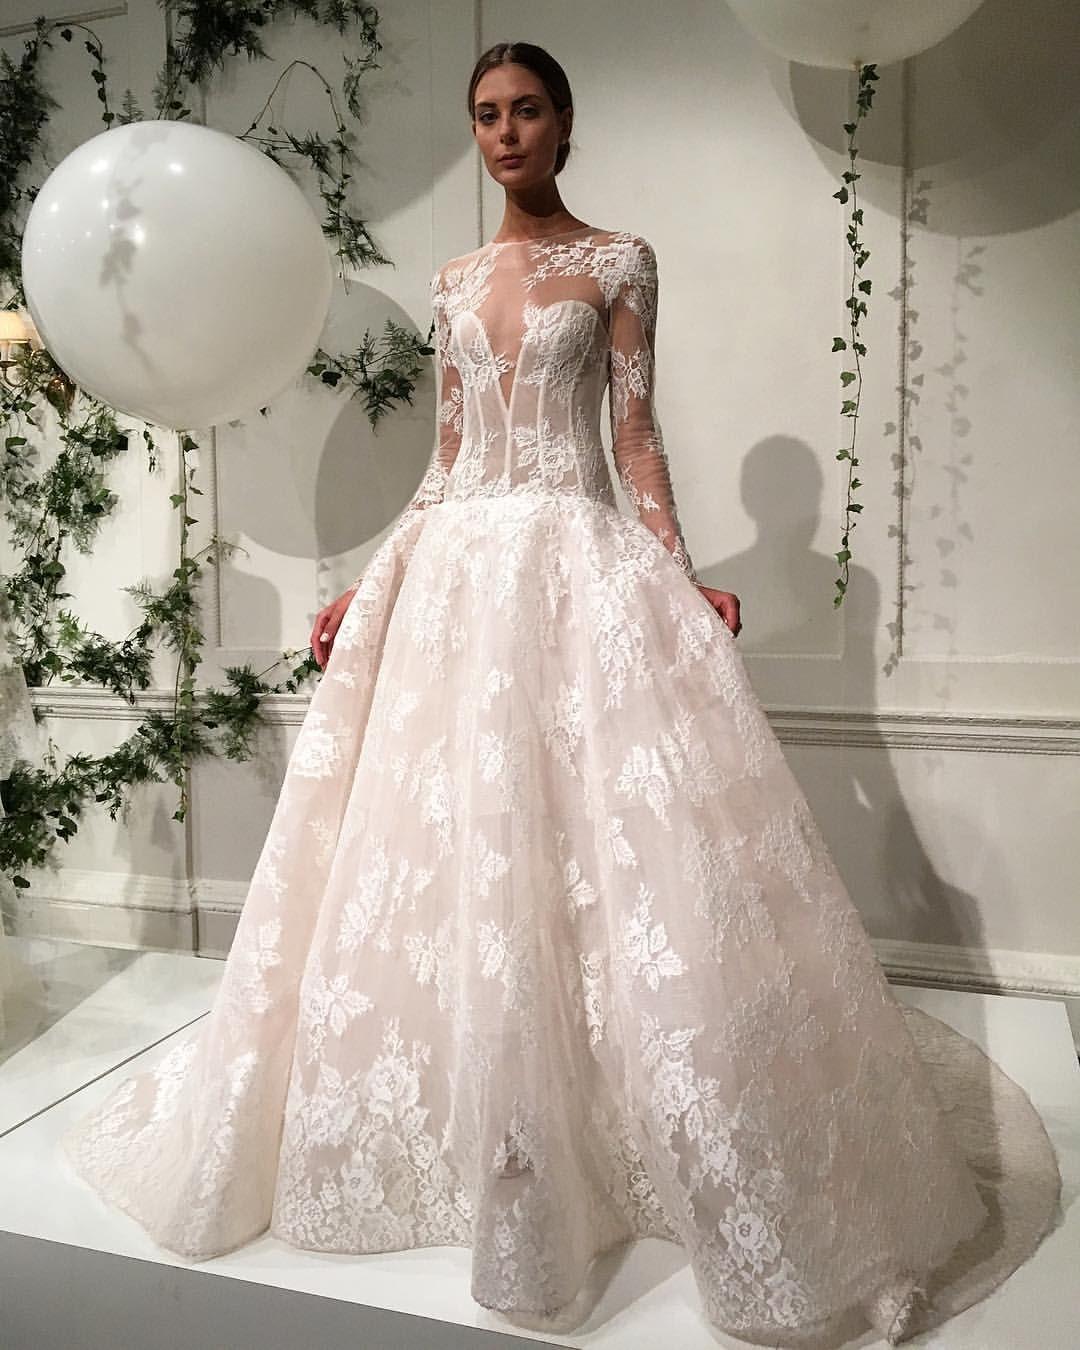 Boho Blush Pink Wedding Dresses 2017 Pretty 3d Flower Lace: Pin By Talia Finkel On Wedding